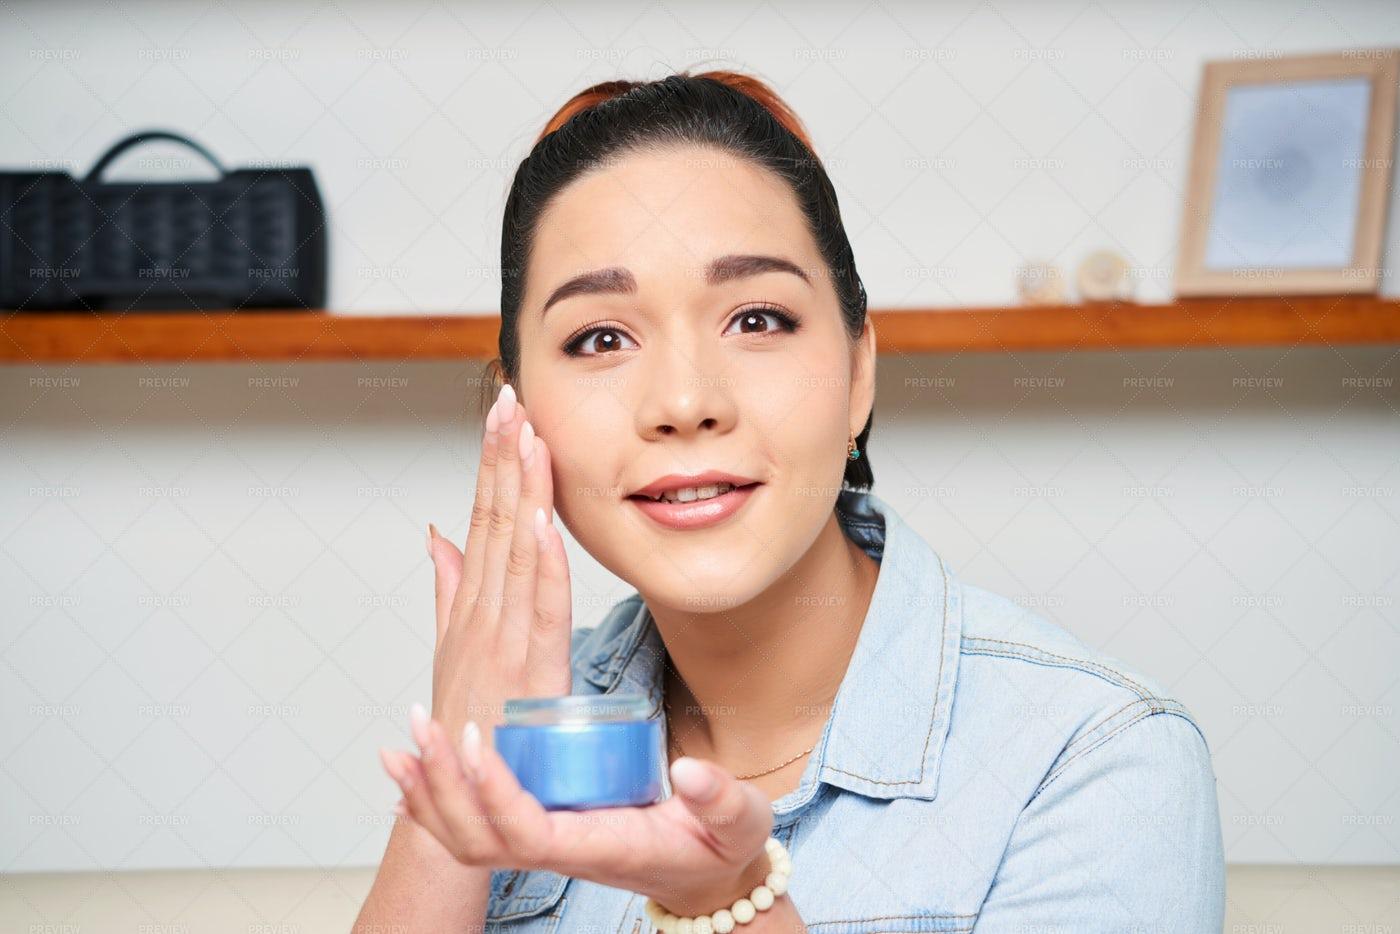 Woman Care For Face: Stock Photos